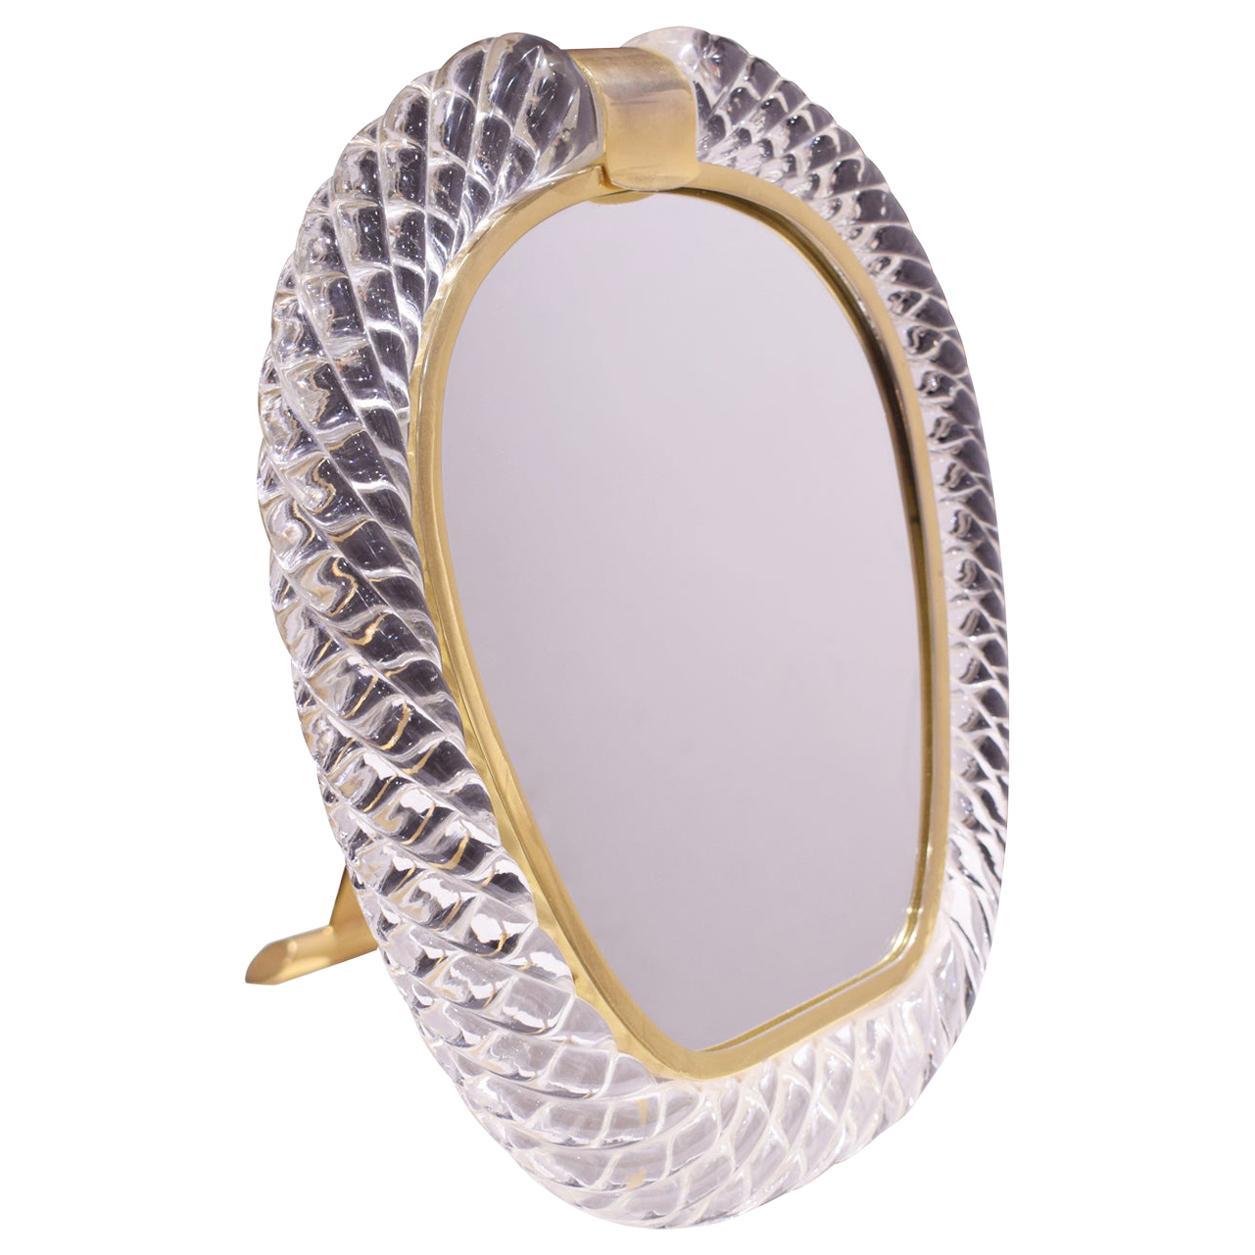 Seguso Large Hand Blown Vanity Mirror 1981 'Signed'